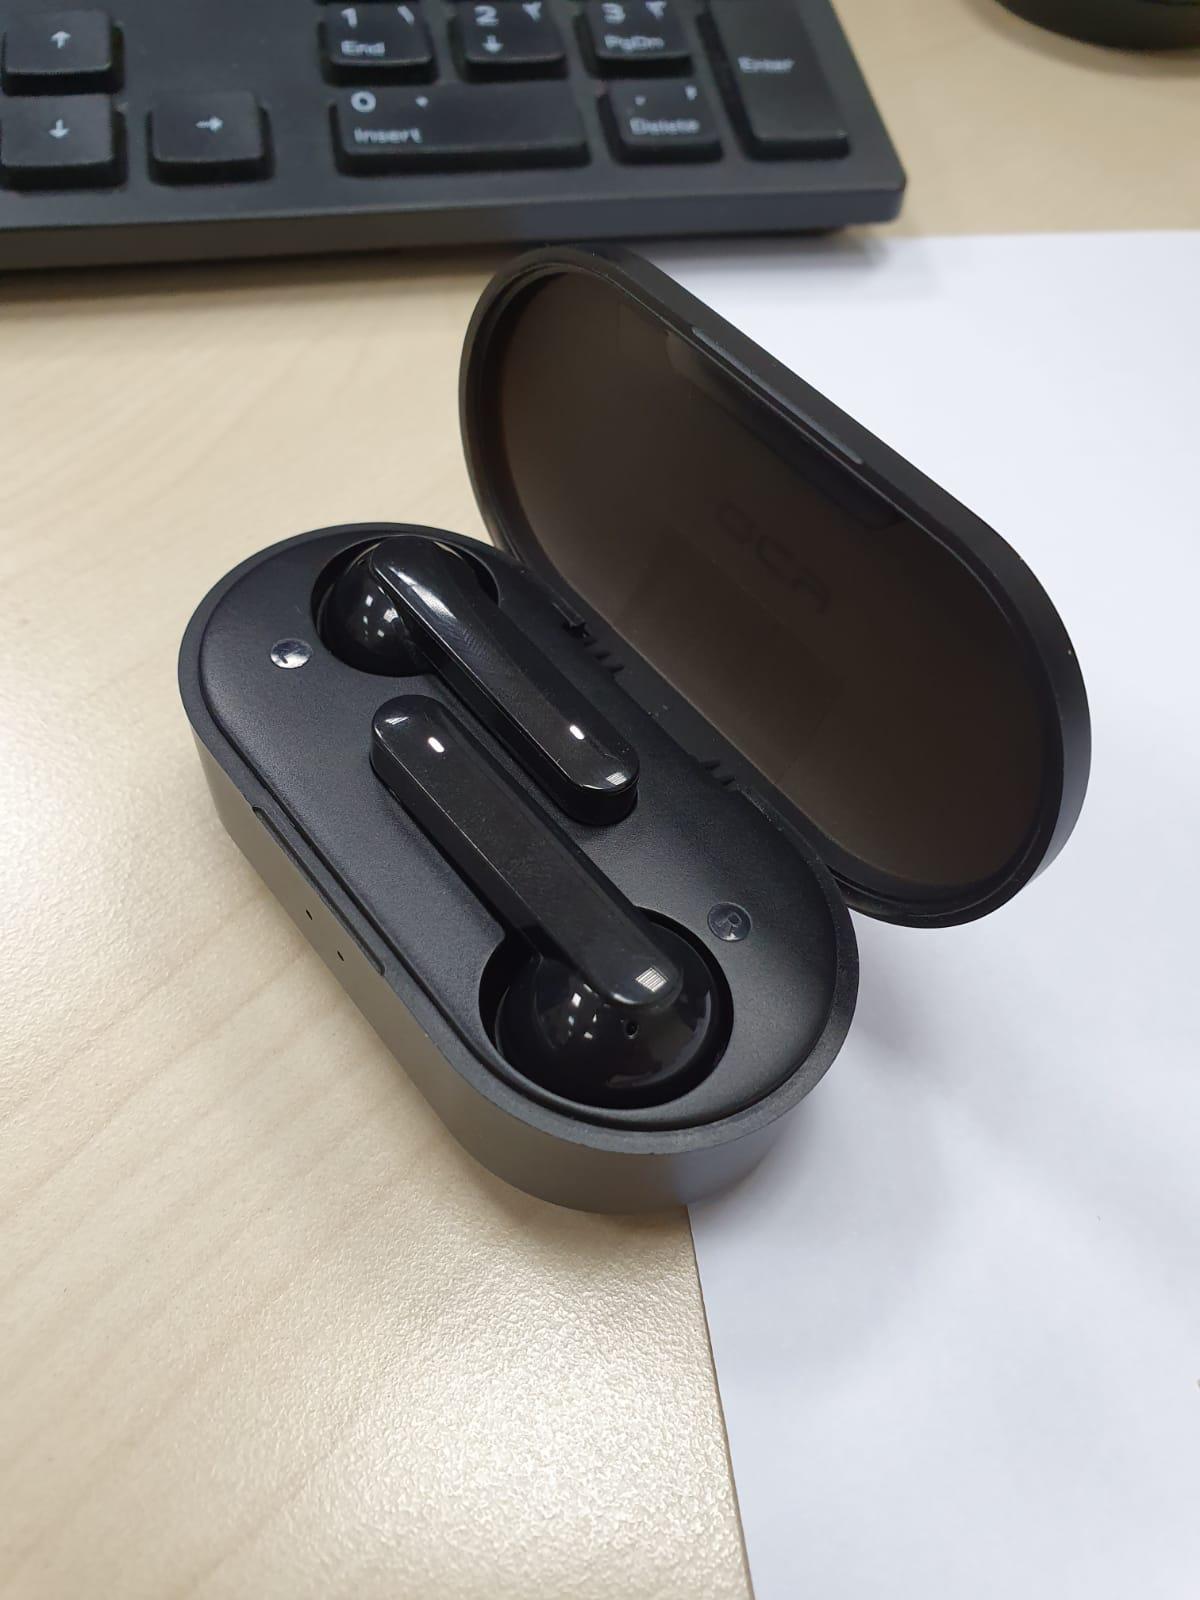 QCY T3 Wireless